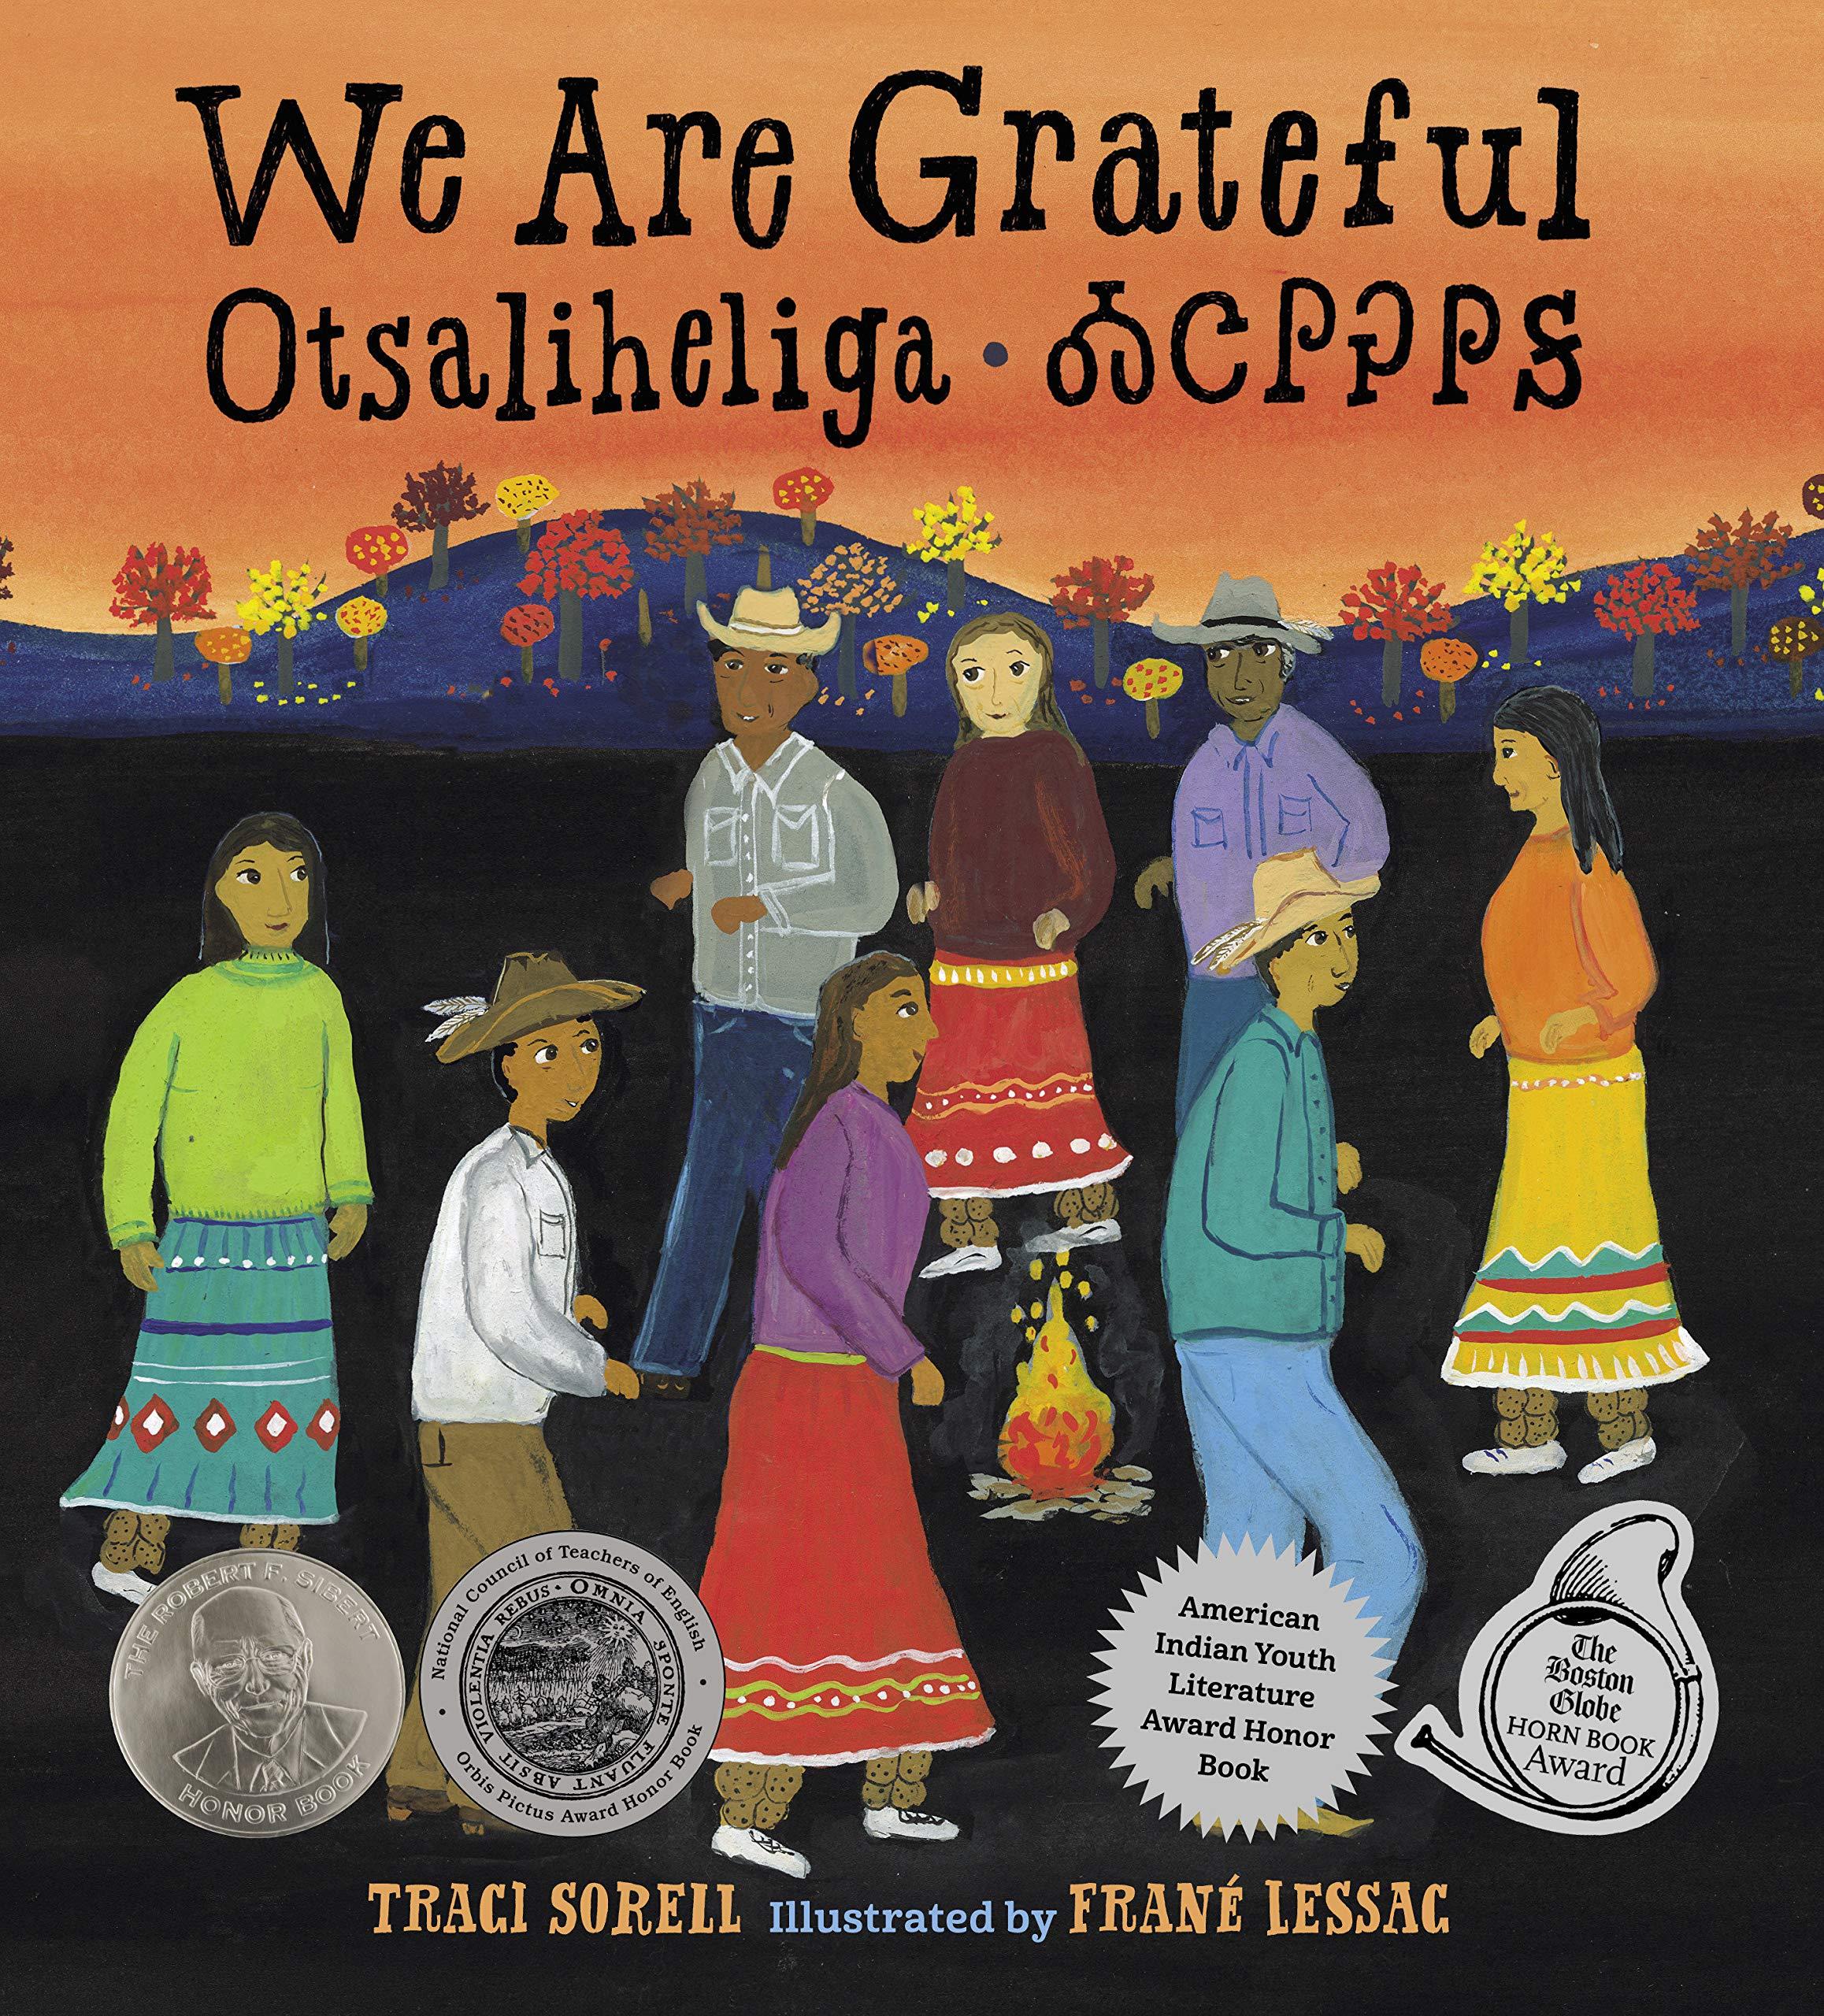 Amazon.com: We Are Grateful: Otsaliheliga: 9781580897723: Sorell, Traci,  Lessac, Frane: Books